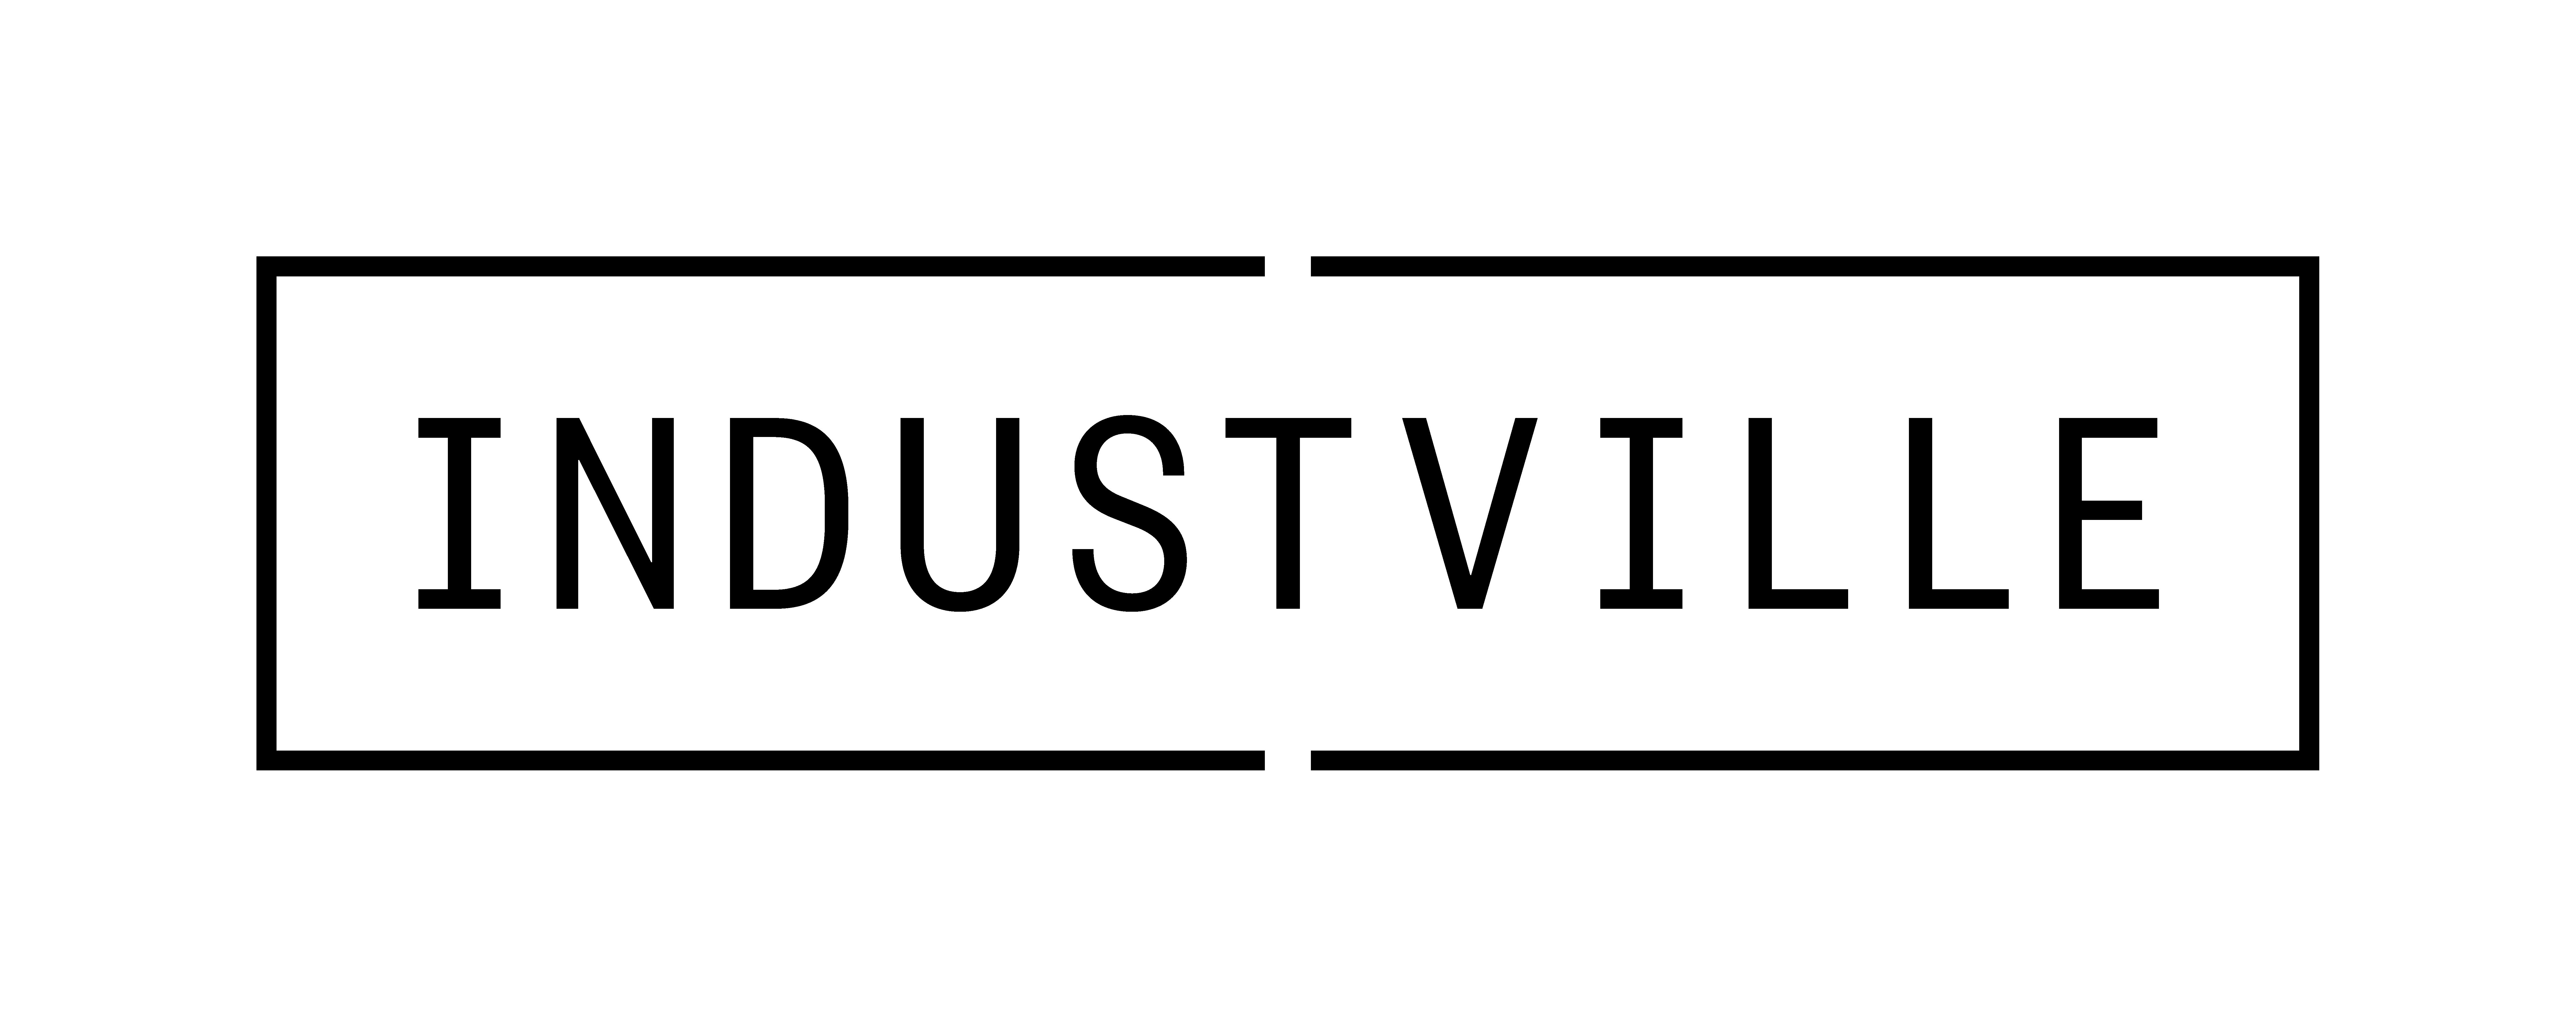 https://www.industville.co.uk/